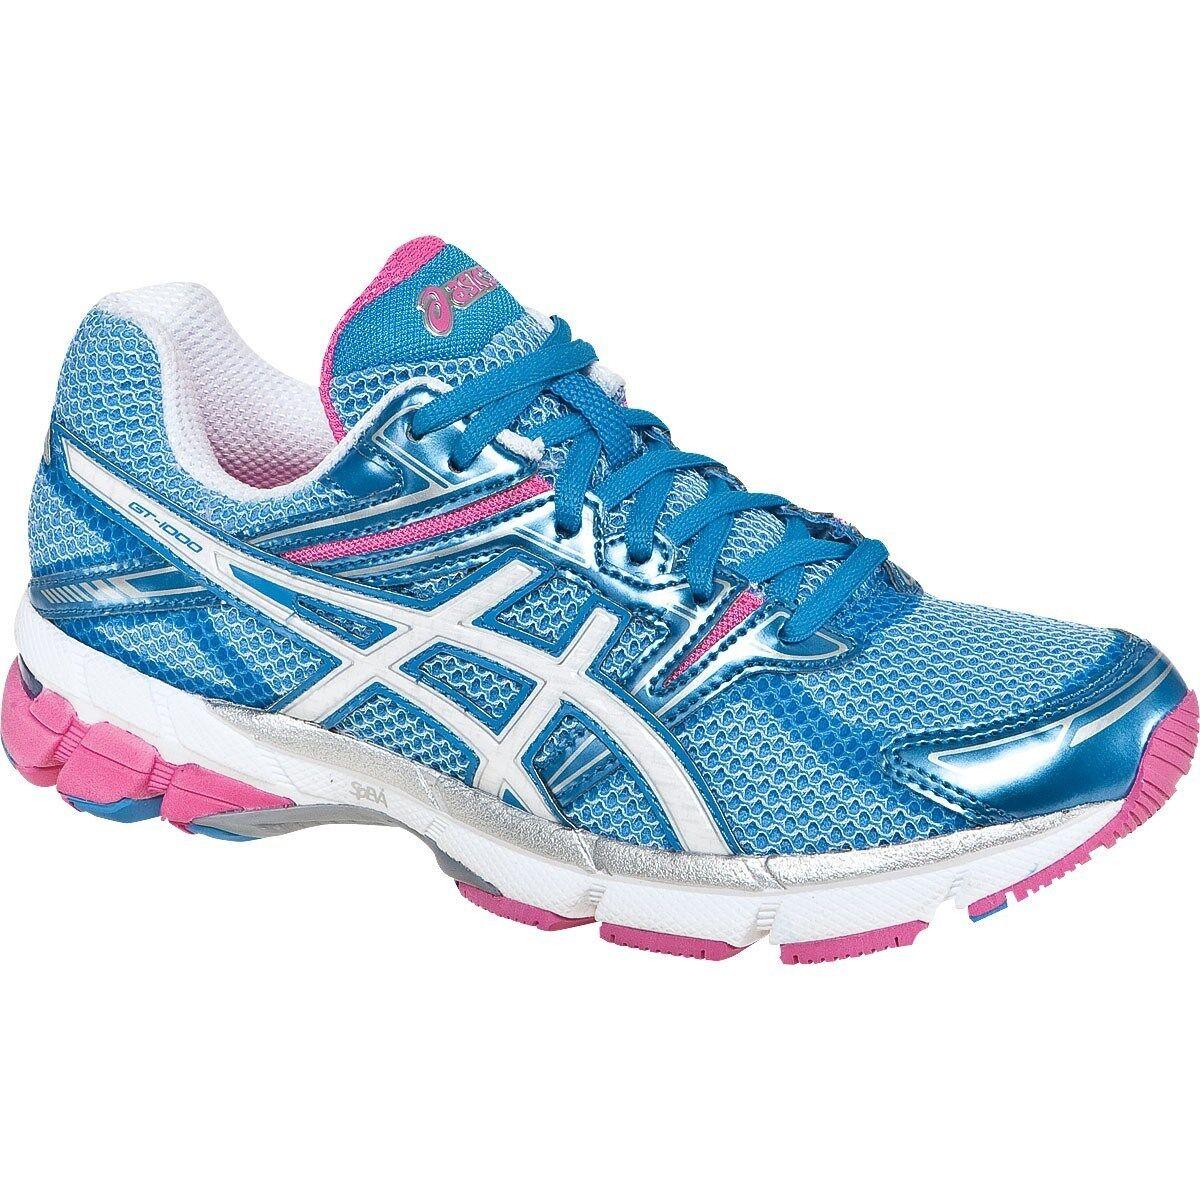 Womens Asics GT 1000 running shoes Island bluee White Pink NIB T2L6N MSRP